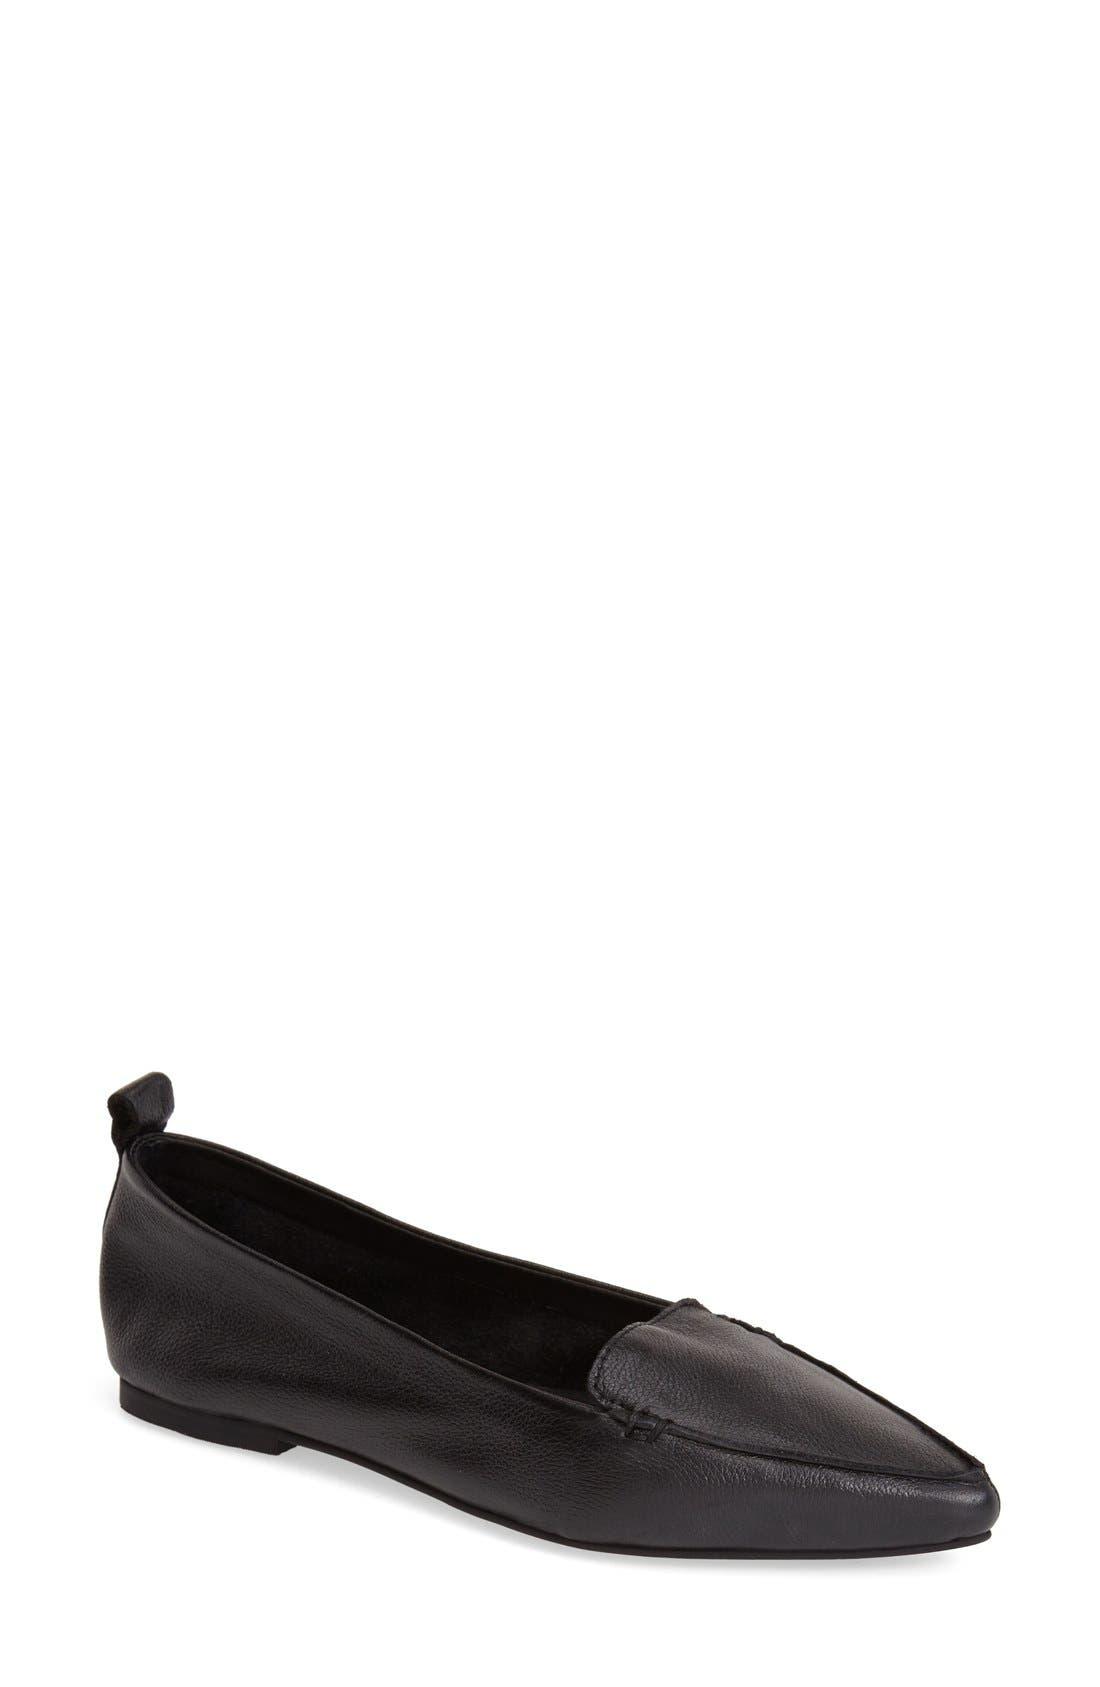 JEFFREY CAMPBELL 'Vionnet' Pointy Toe Flat, Main, color, 001